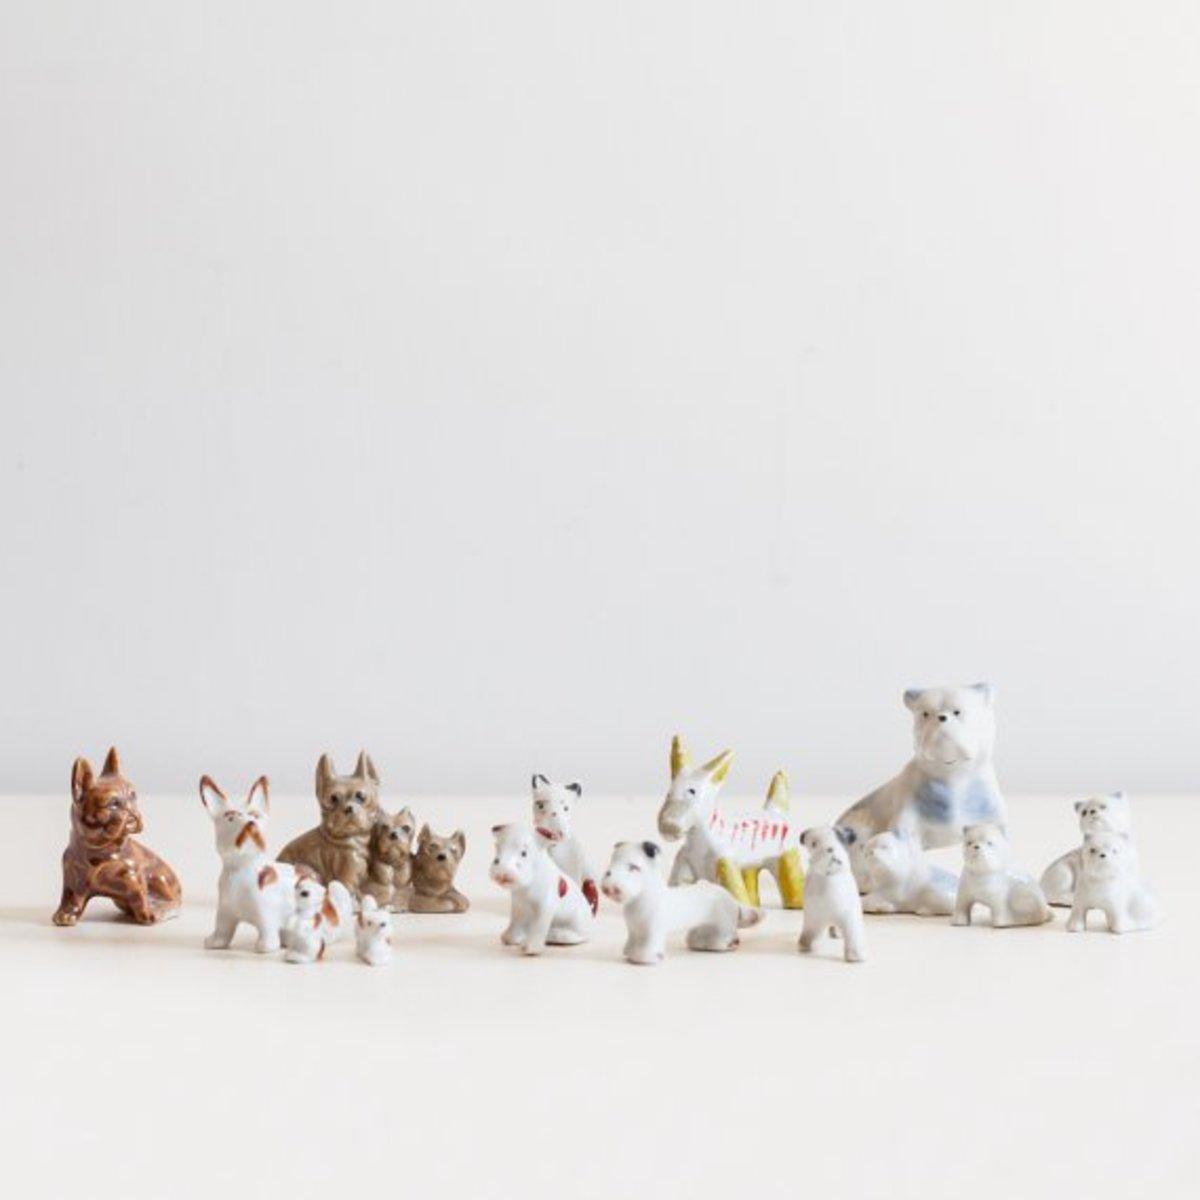 Ceramic figurine collection.